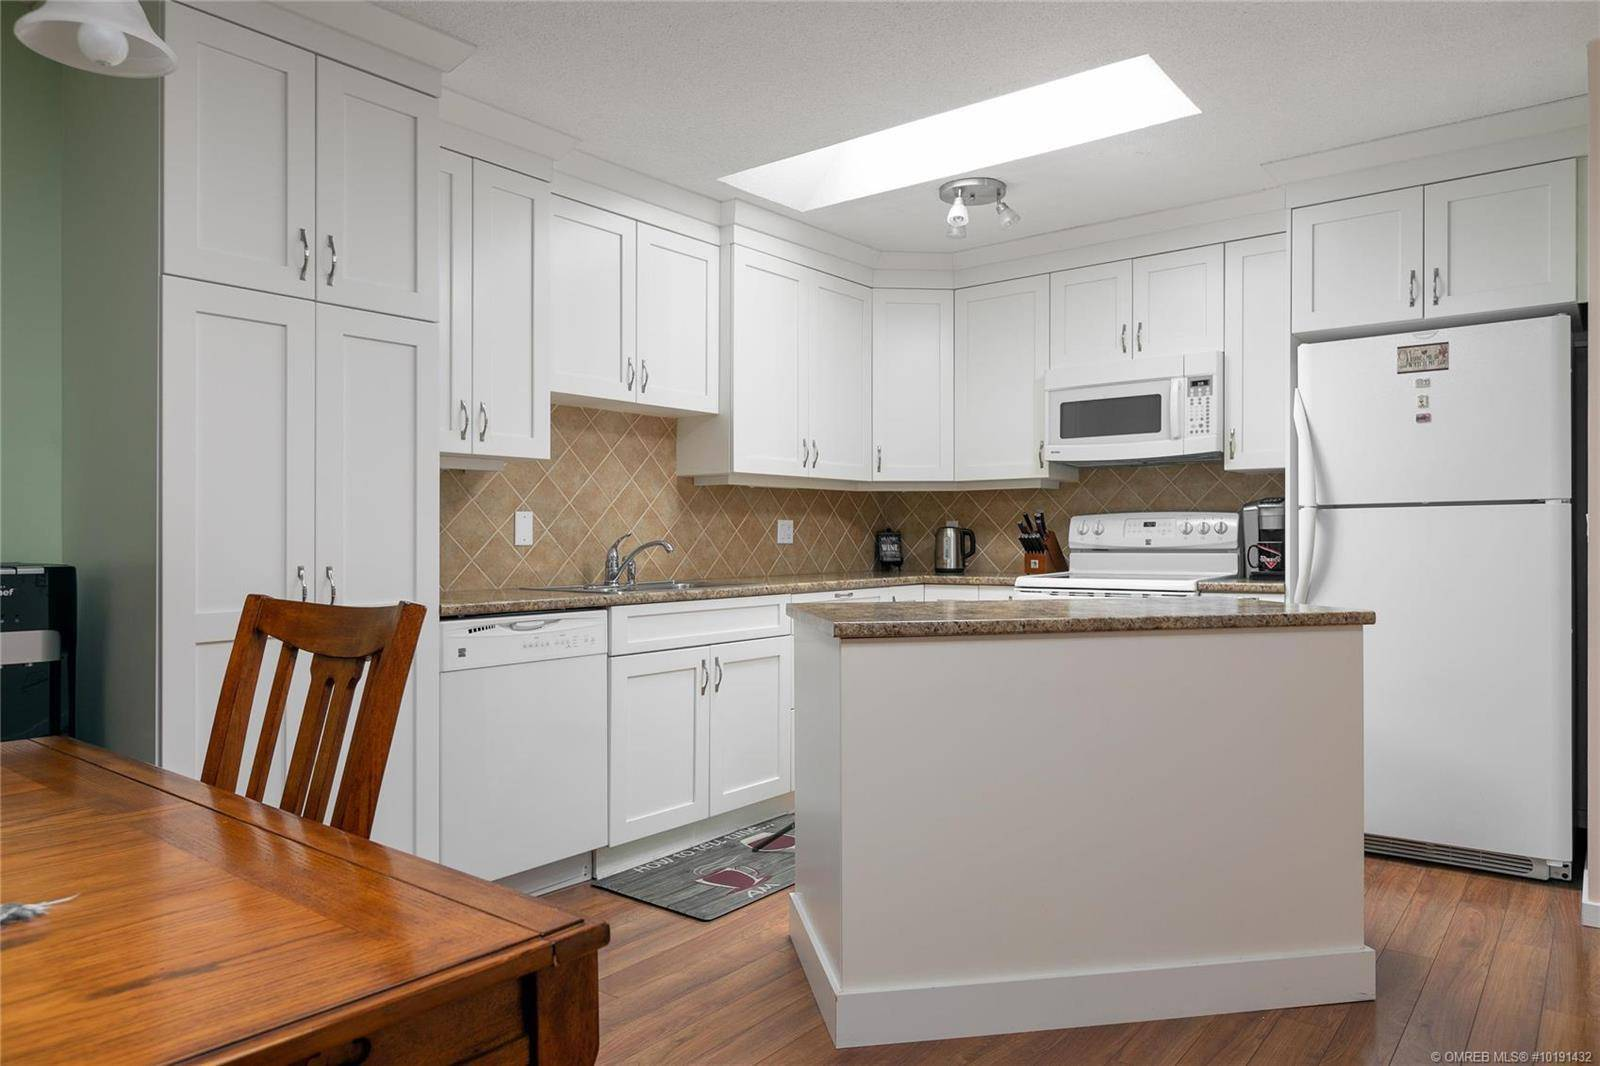 Condo for sale at 1640 Ufton Ct Unit 305 Kelowna British Columbia - MLS: 10191432